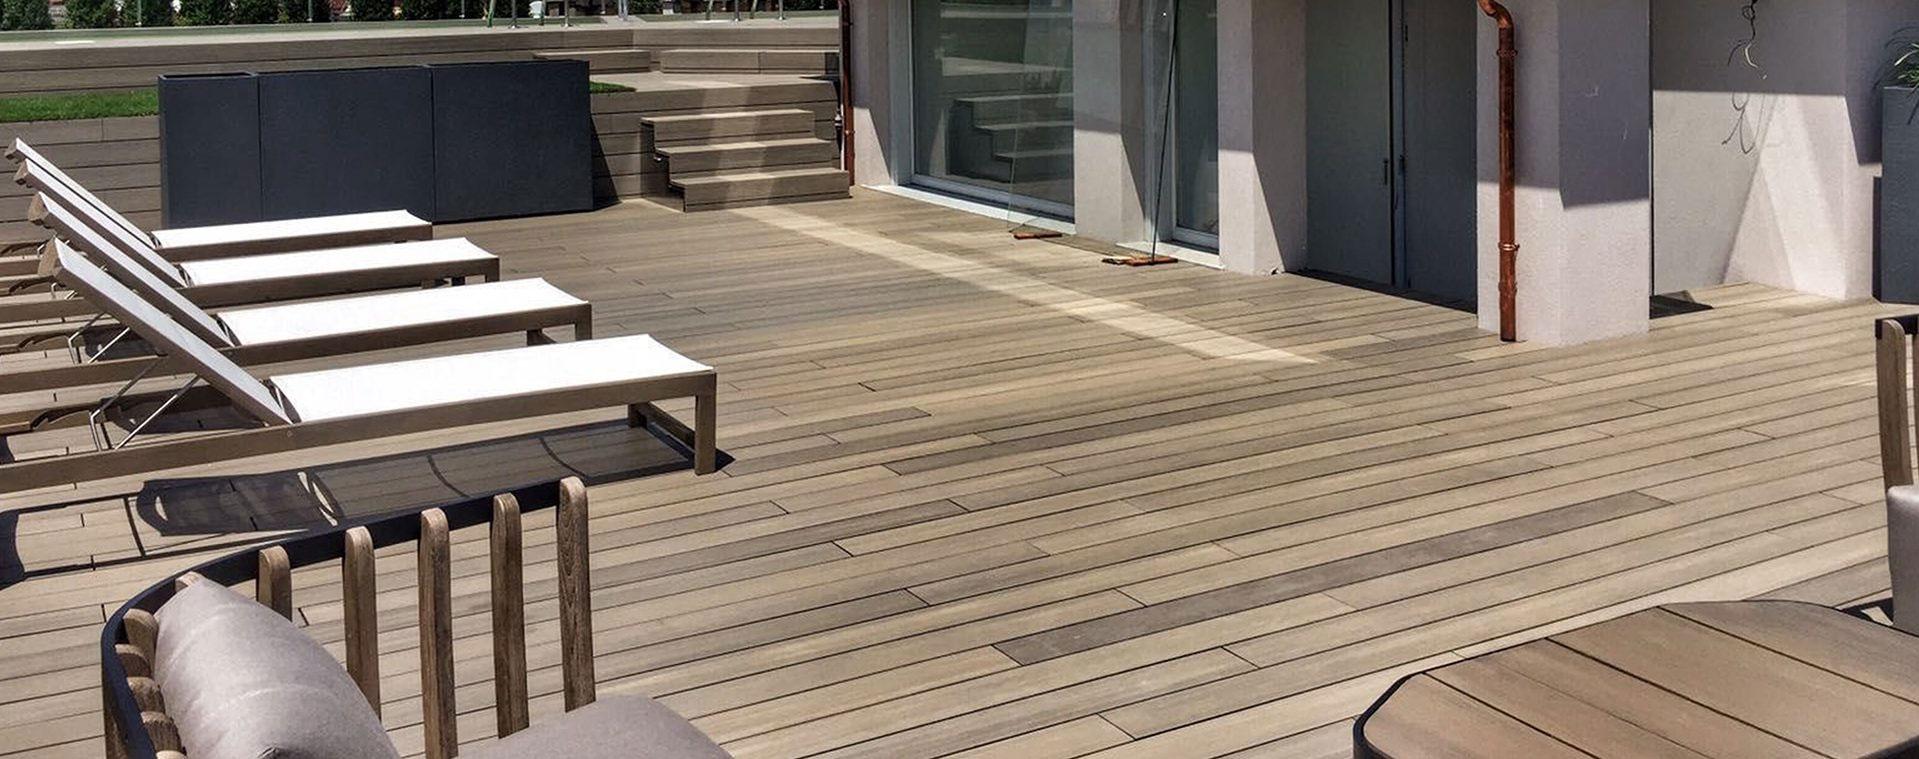 natural-deck-bahce-zemin-kaplama